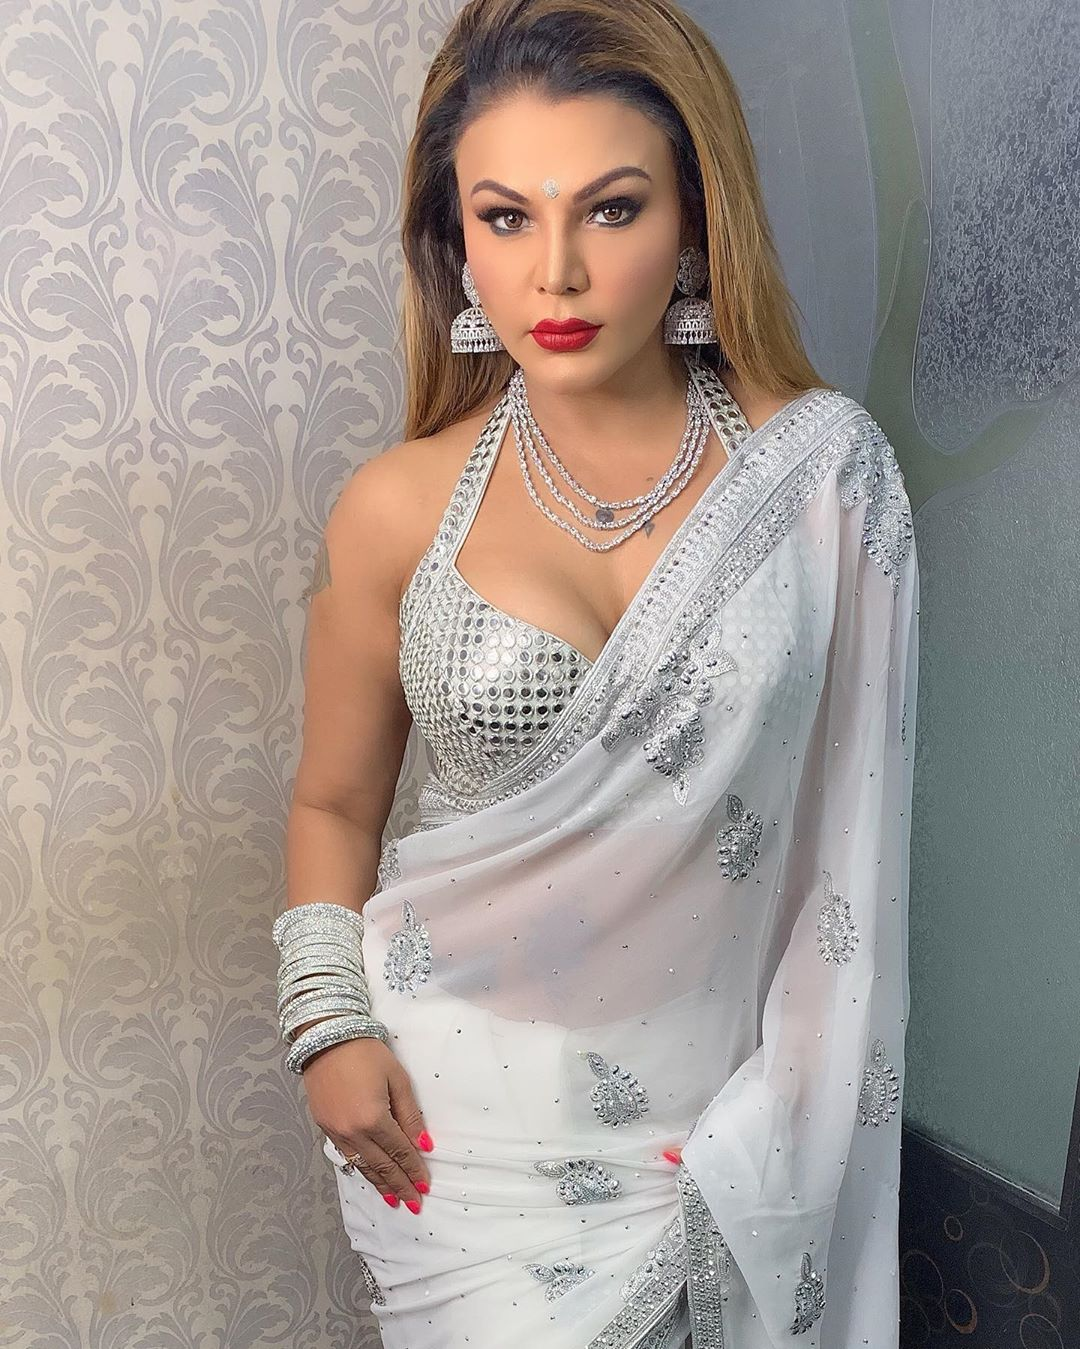 Bollywood Tadka,राखी सावंत इमेज,राखी सावंत फोटो,राखी सावंत पिक्चर,